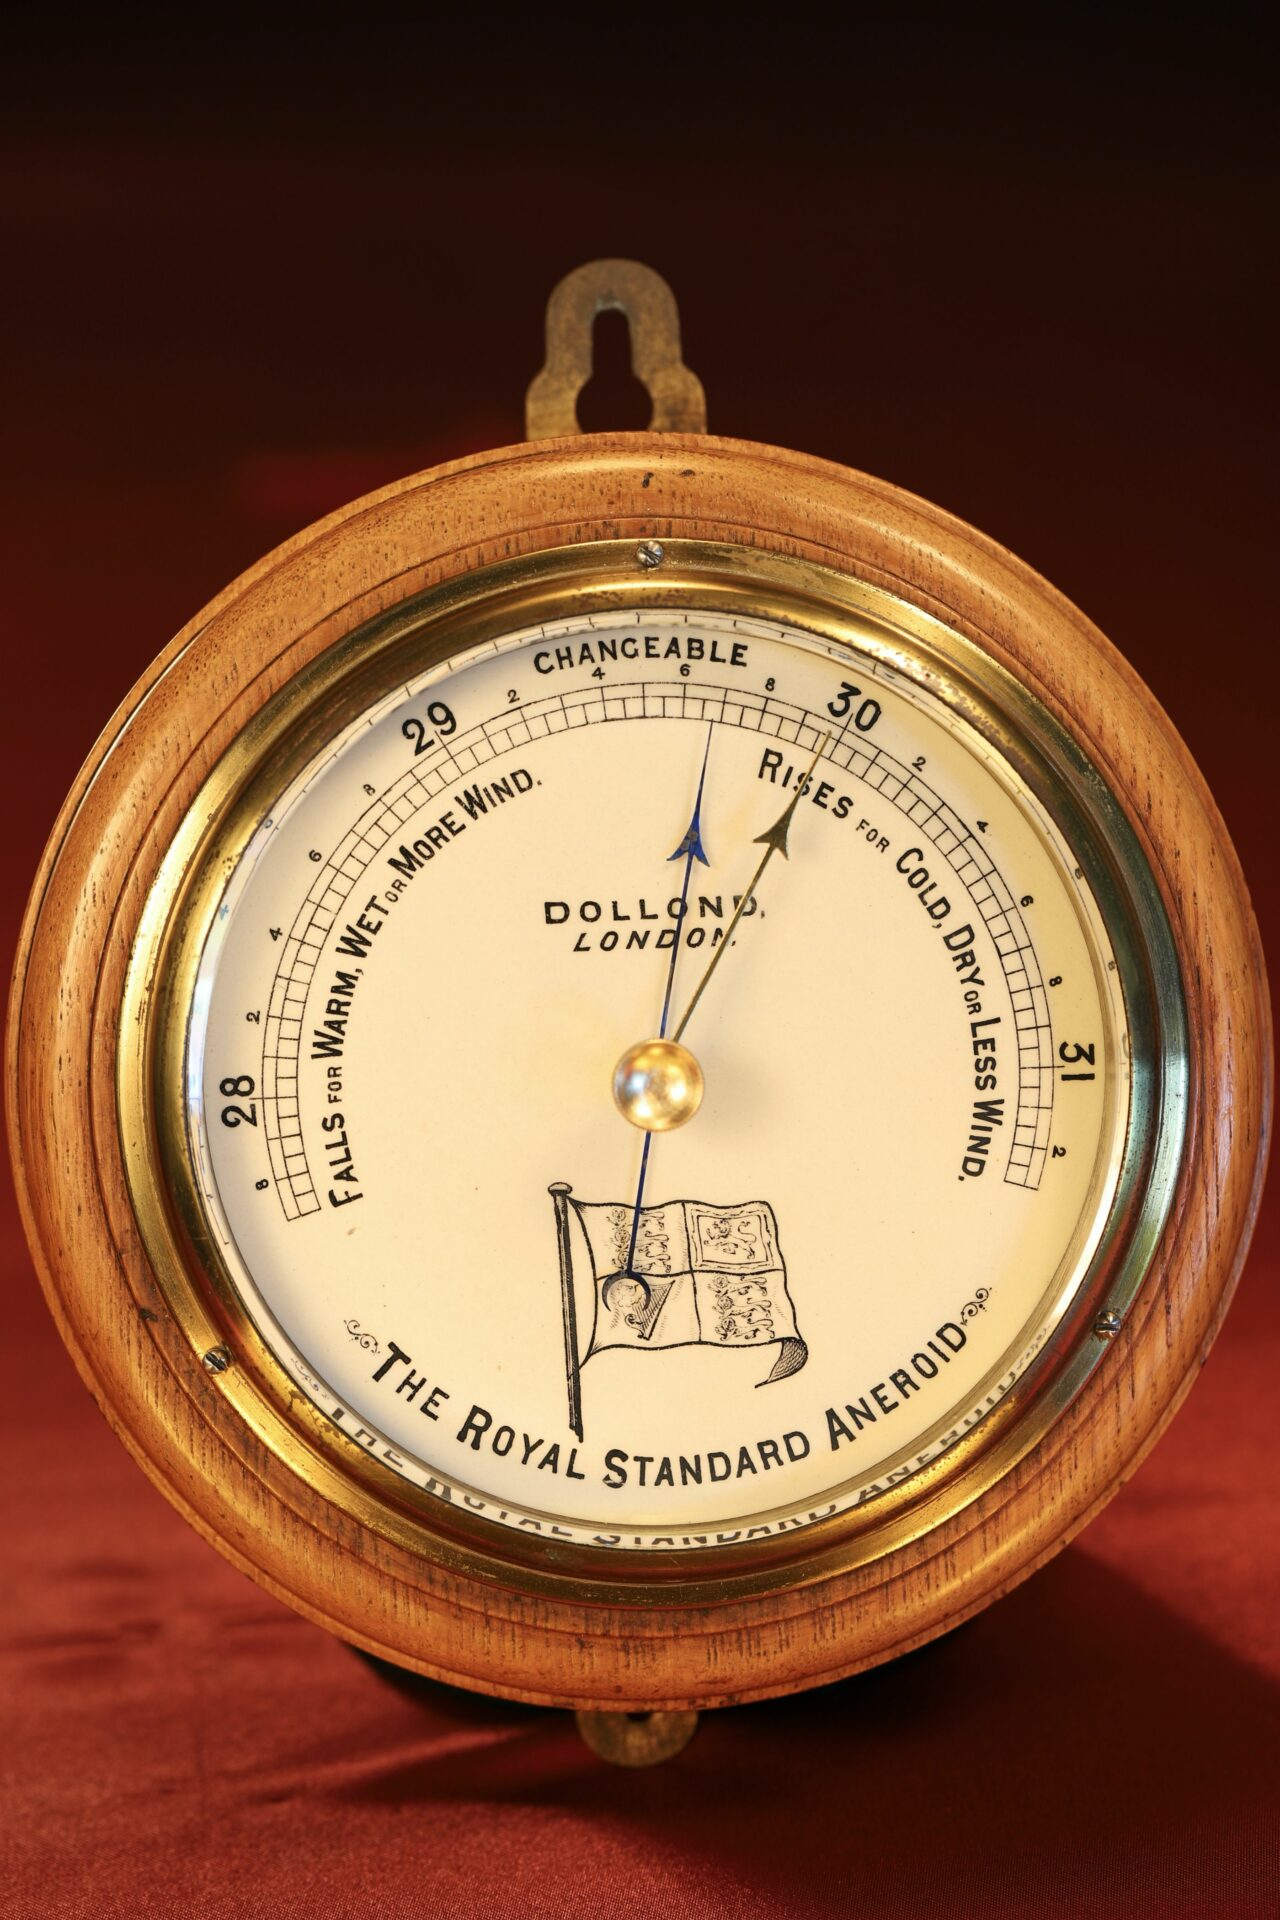 Image of Dollond Royal Standard Marine Barometer c1880 taken from front